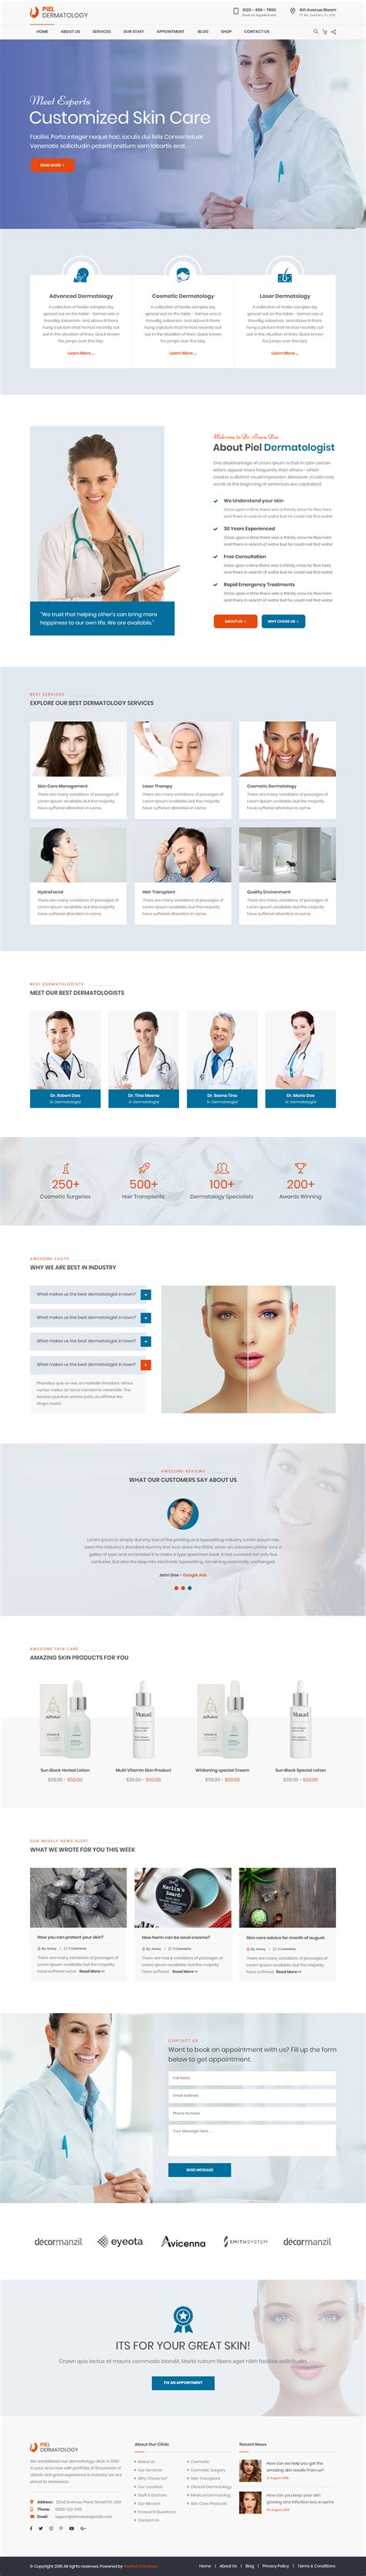 Piel Dermatologist Medical Html Template Dermatologist Website Templates